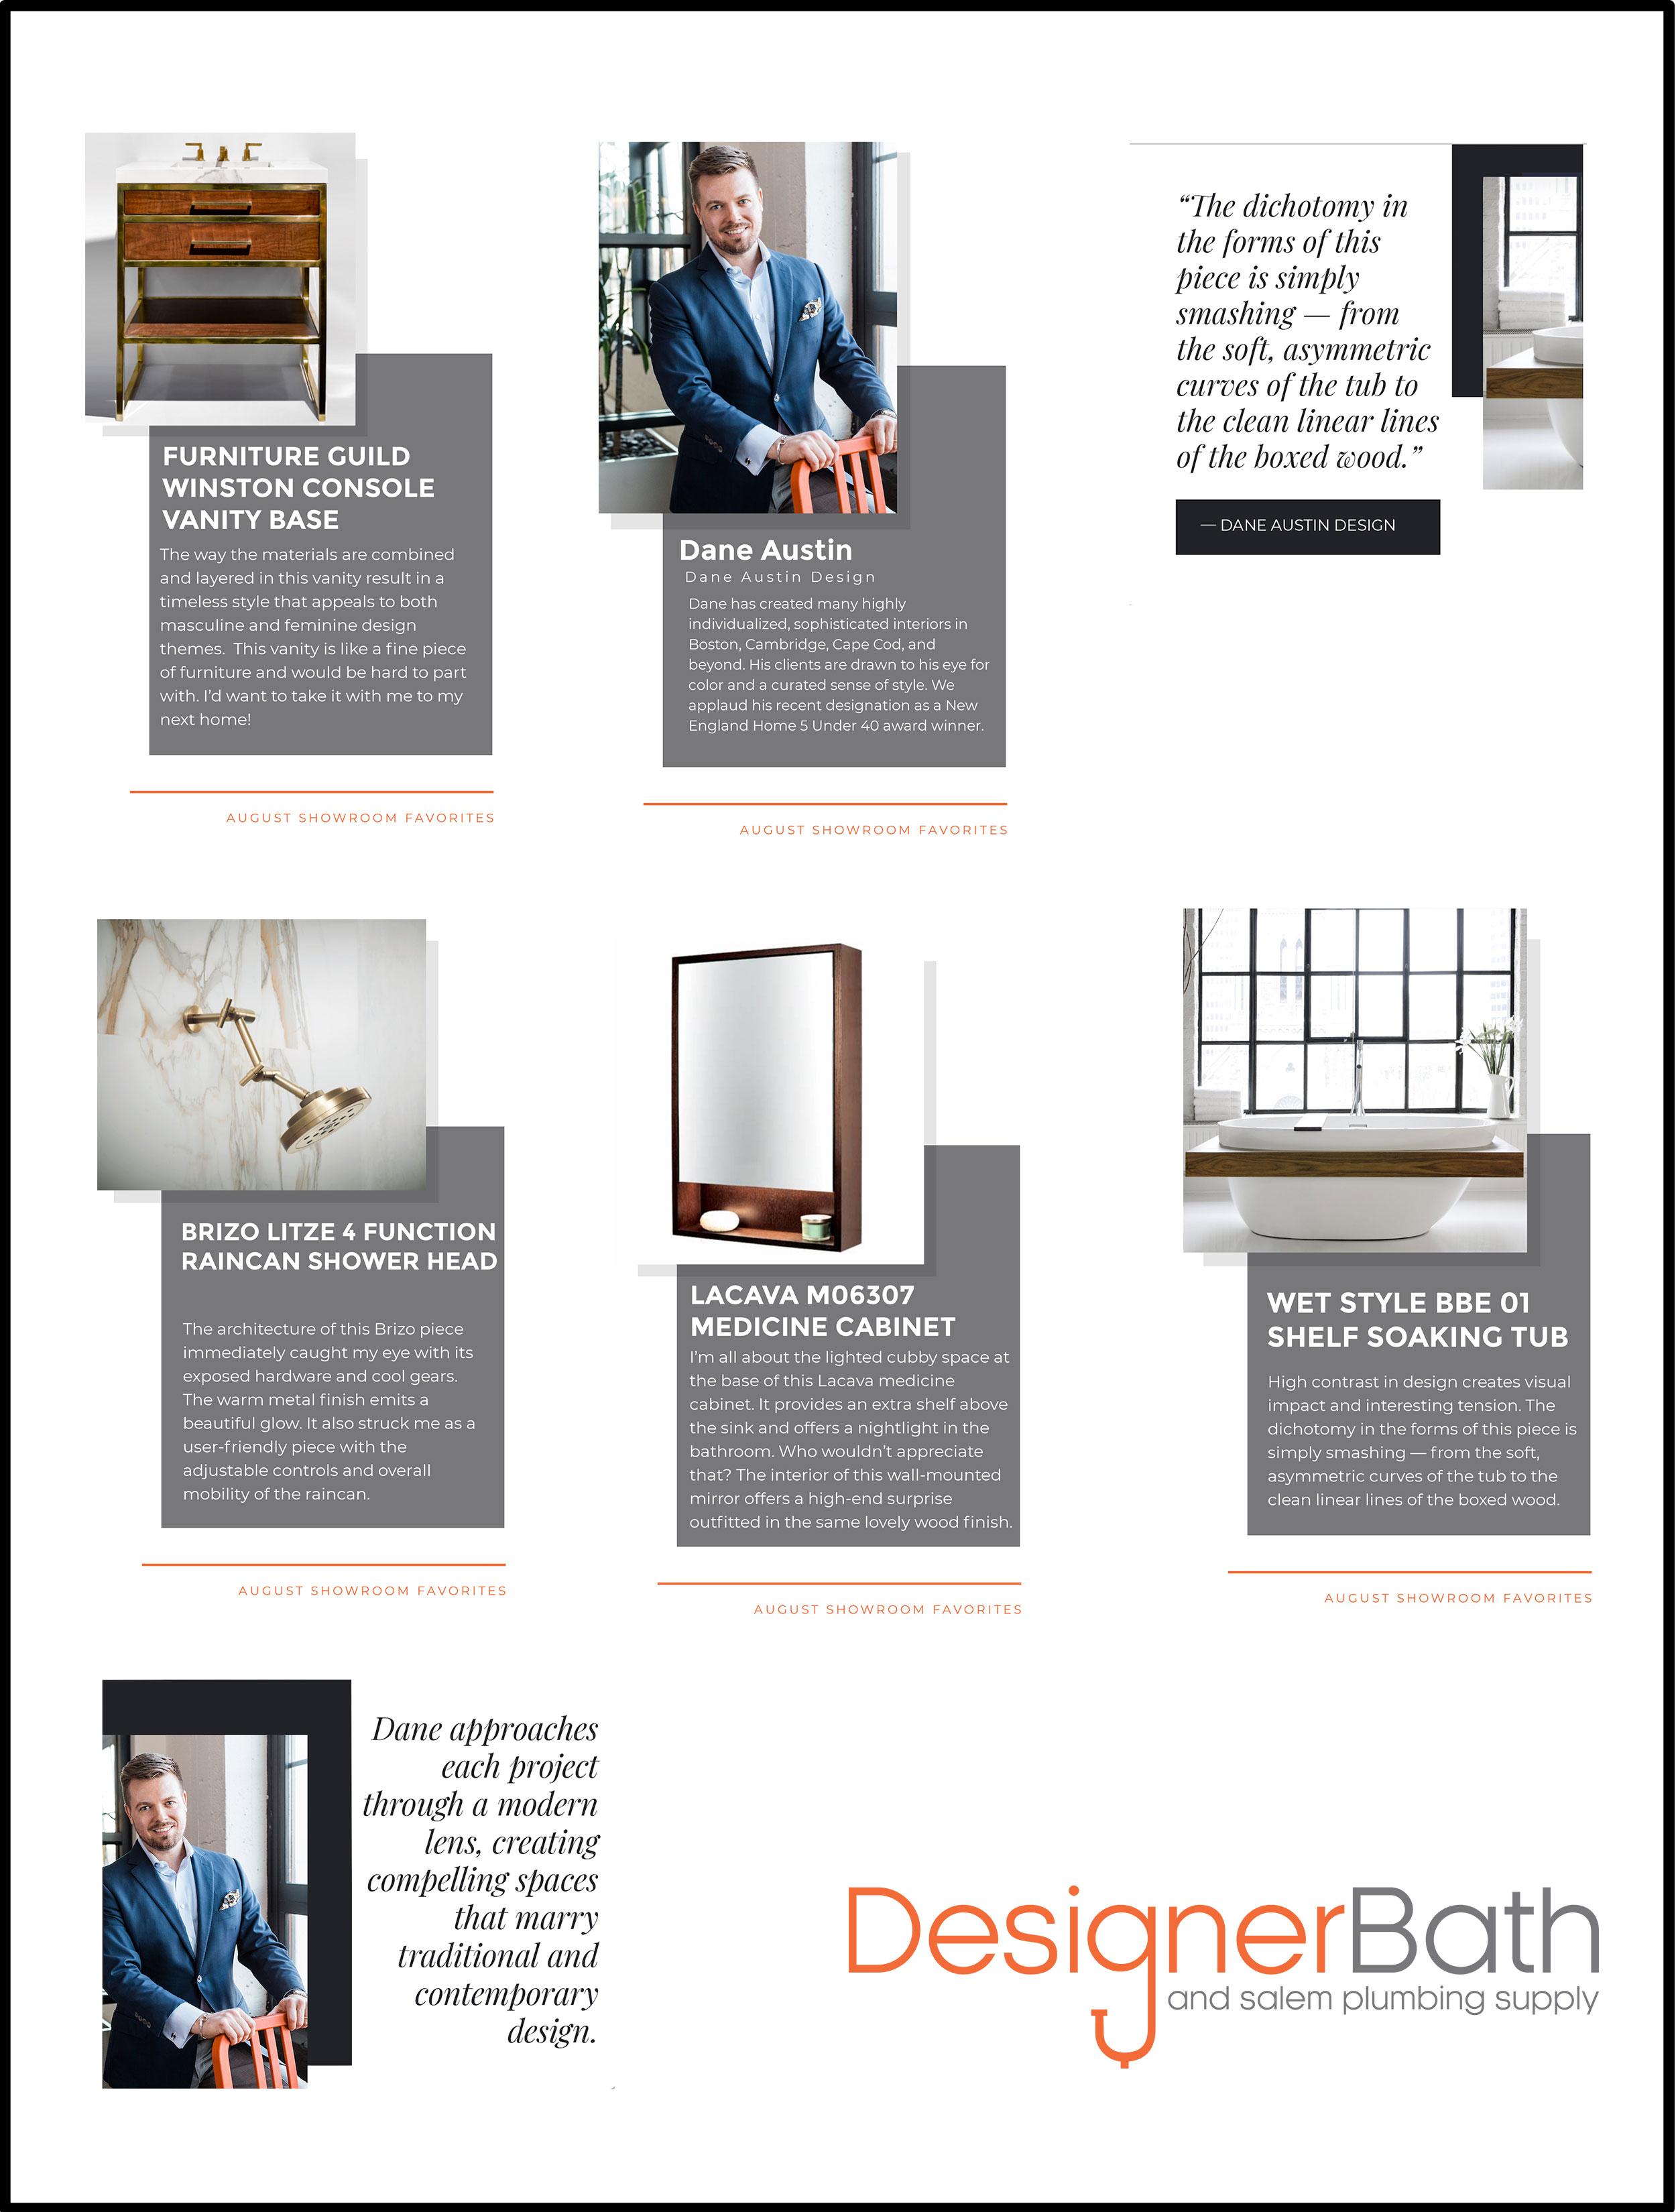 Designer Bath Instagram story